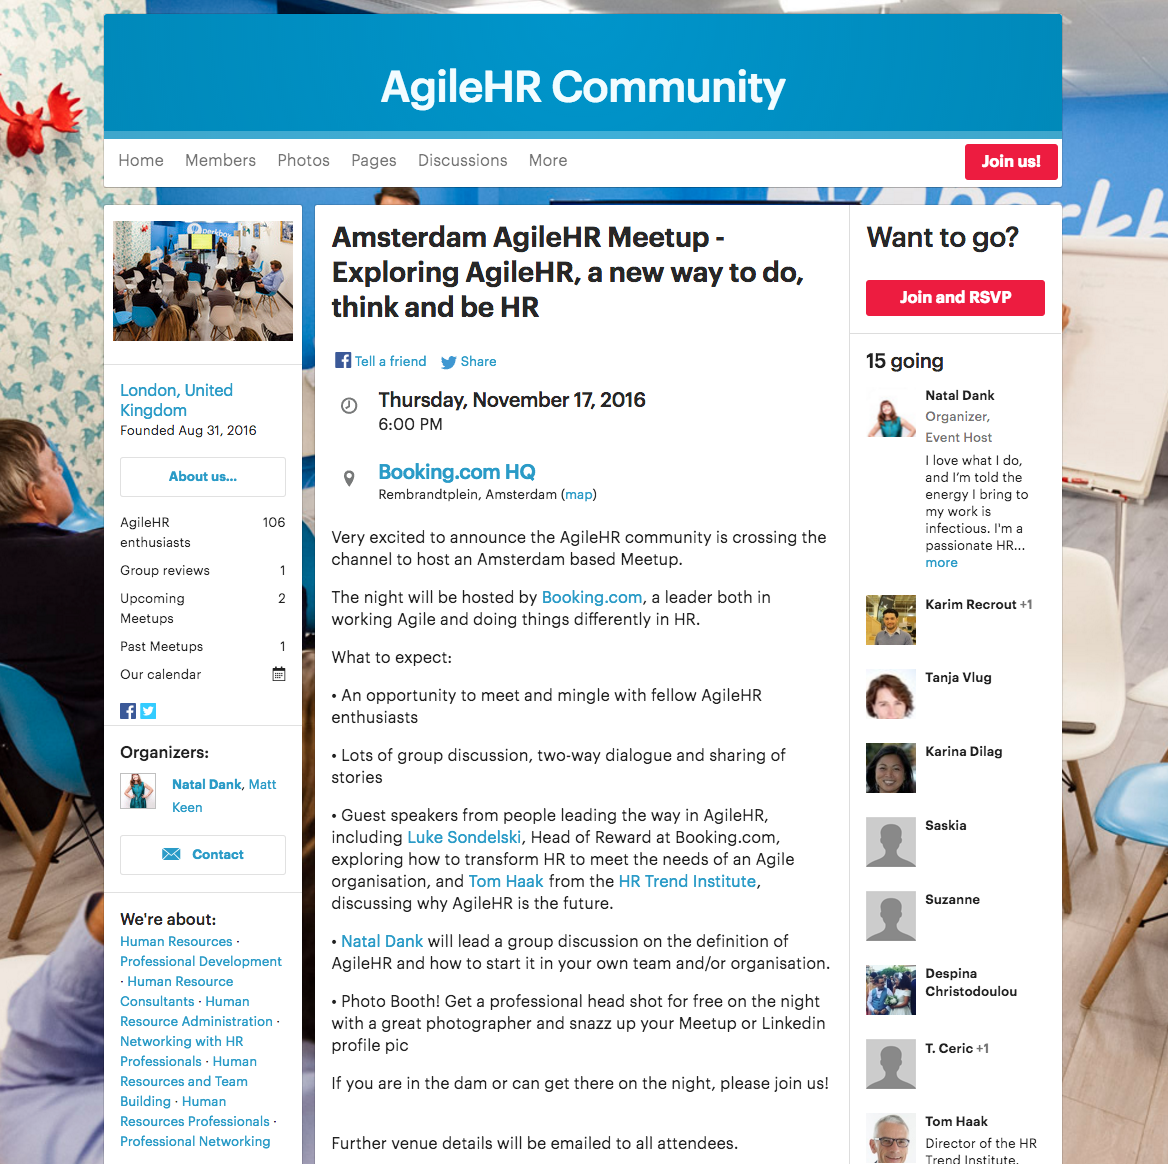 Agile HR Community